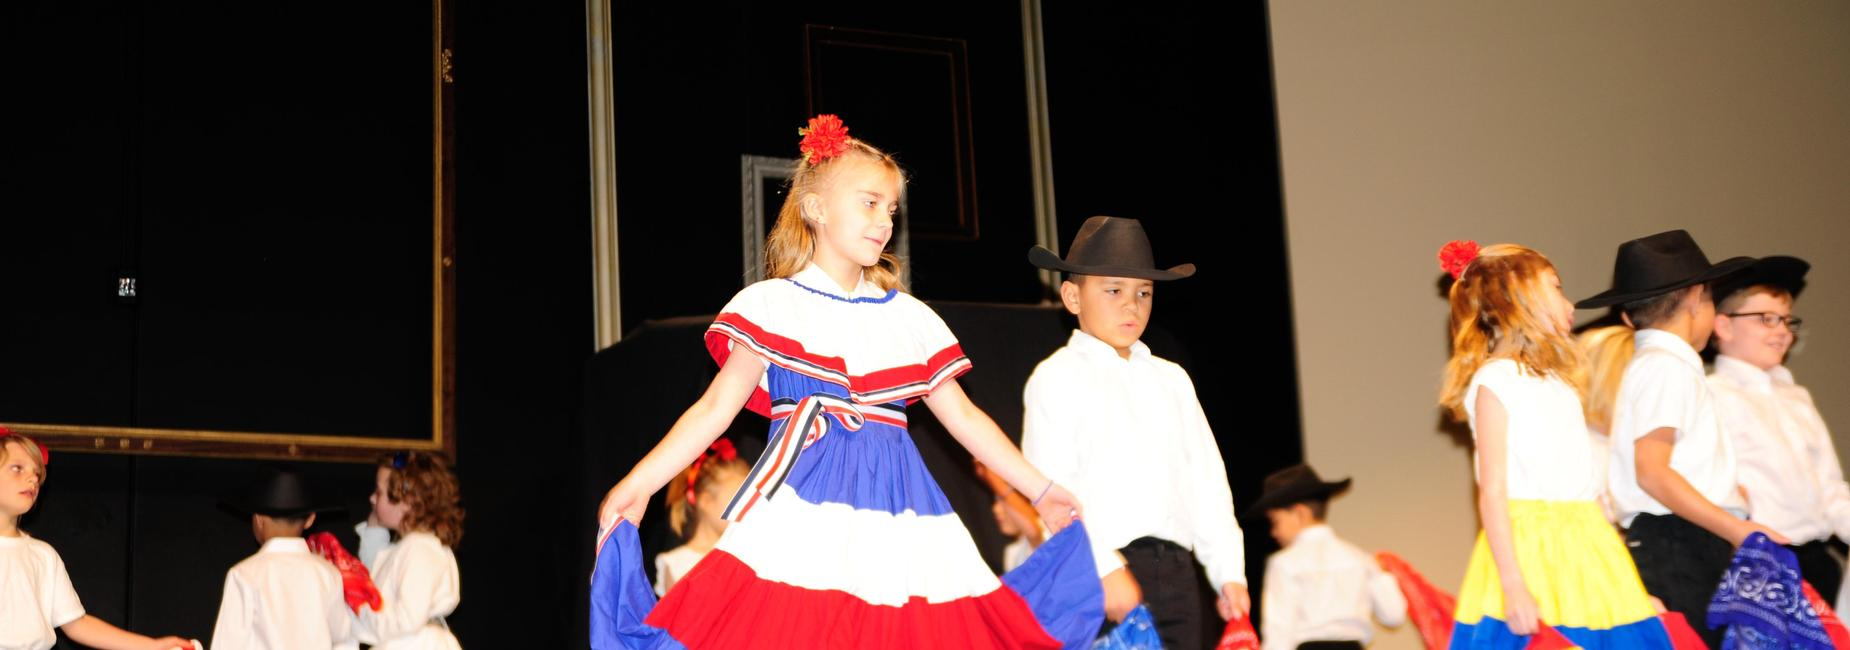 Children dancing in traditional dress